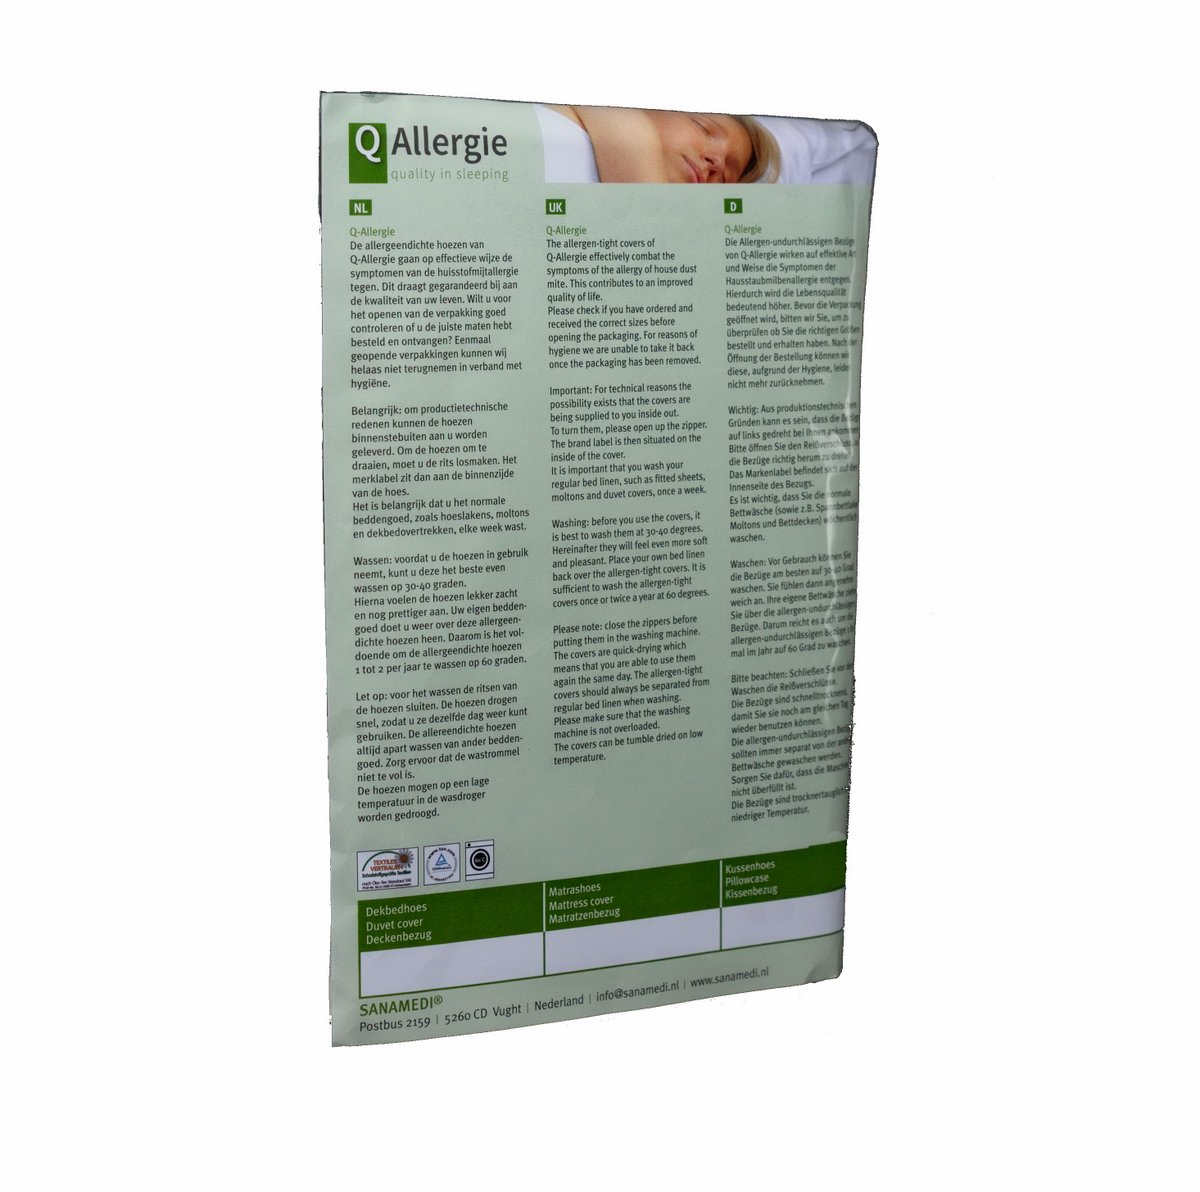 Kussenhoes Q-Allergie 60 x 60 cm | Anti allergie kussenhoes